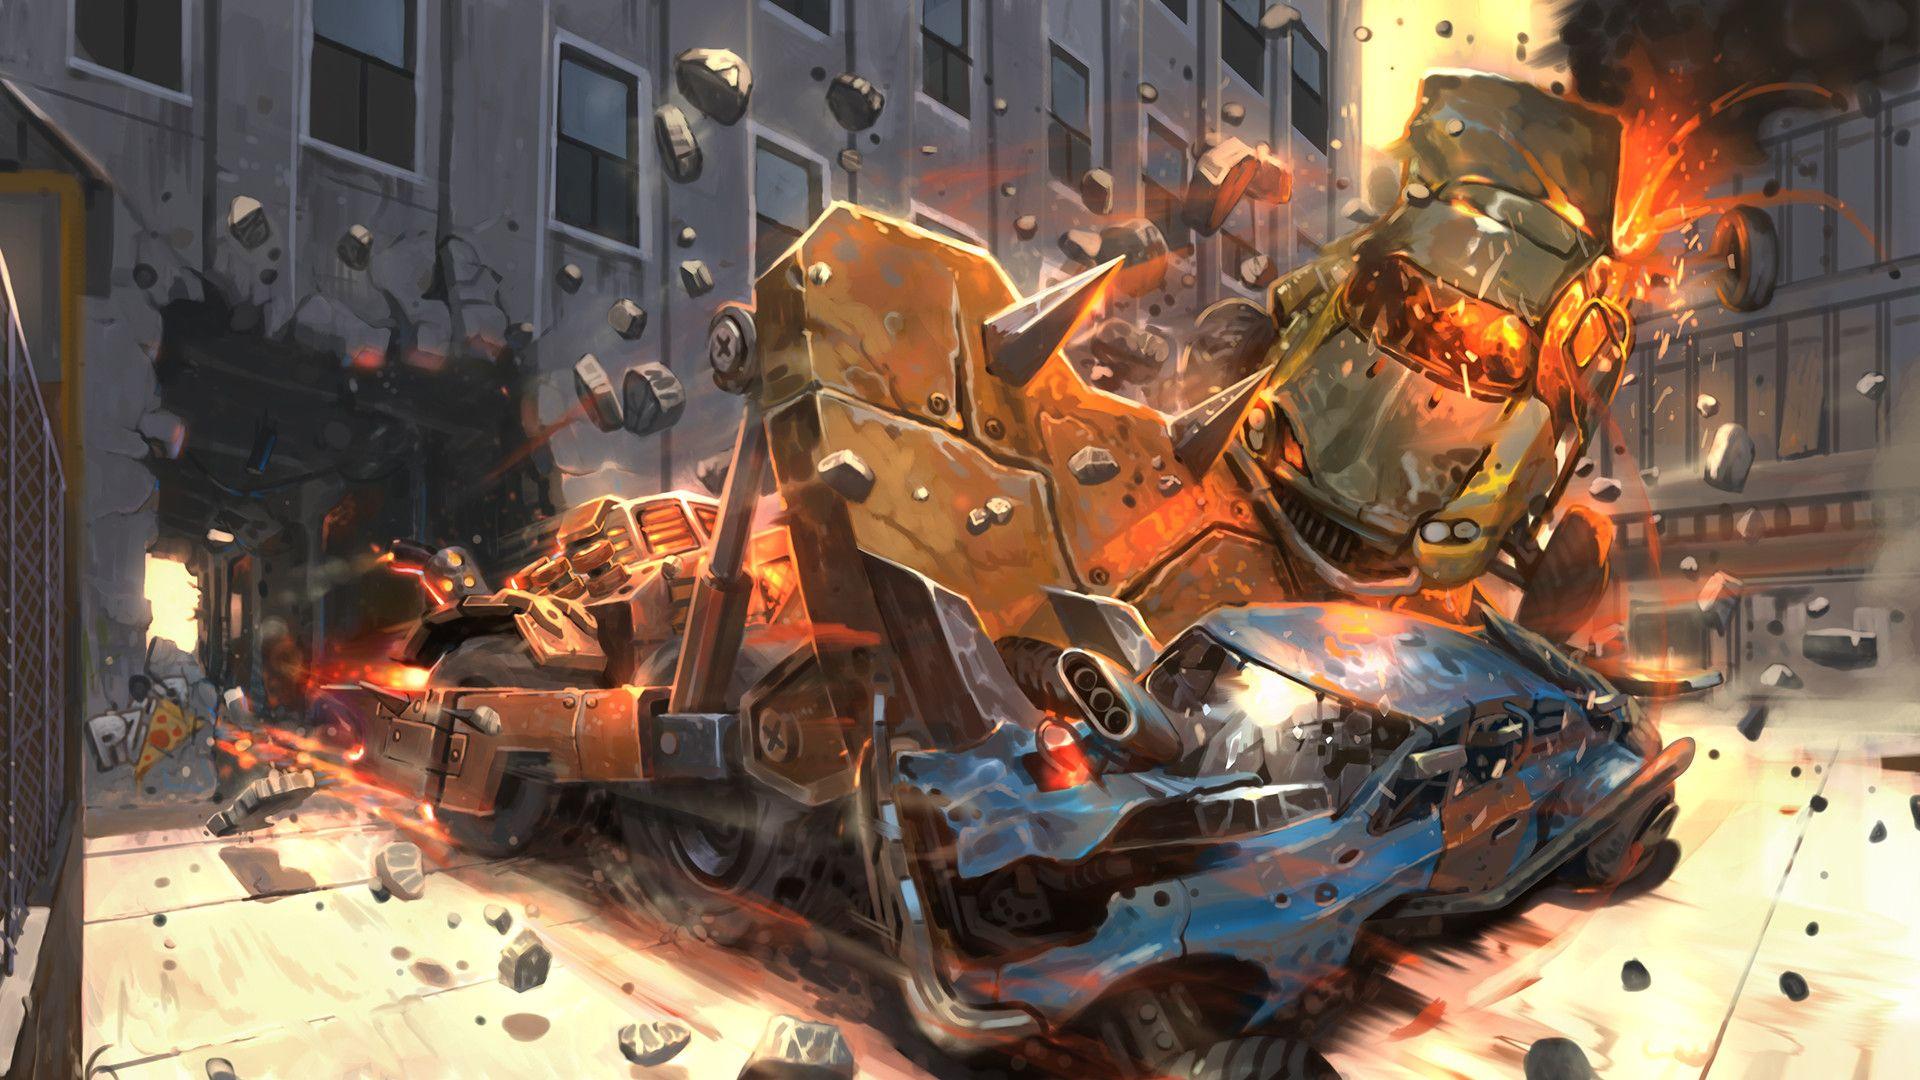 Artstation Heavy Metal Machines Raqsonu Duhu Heavy Metal Metal Artwork Hd wallpaper heavy metal machines game